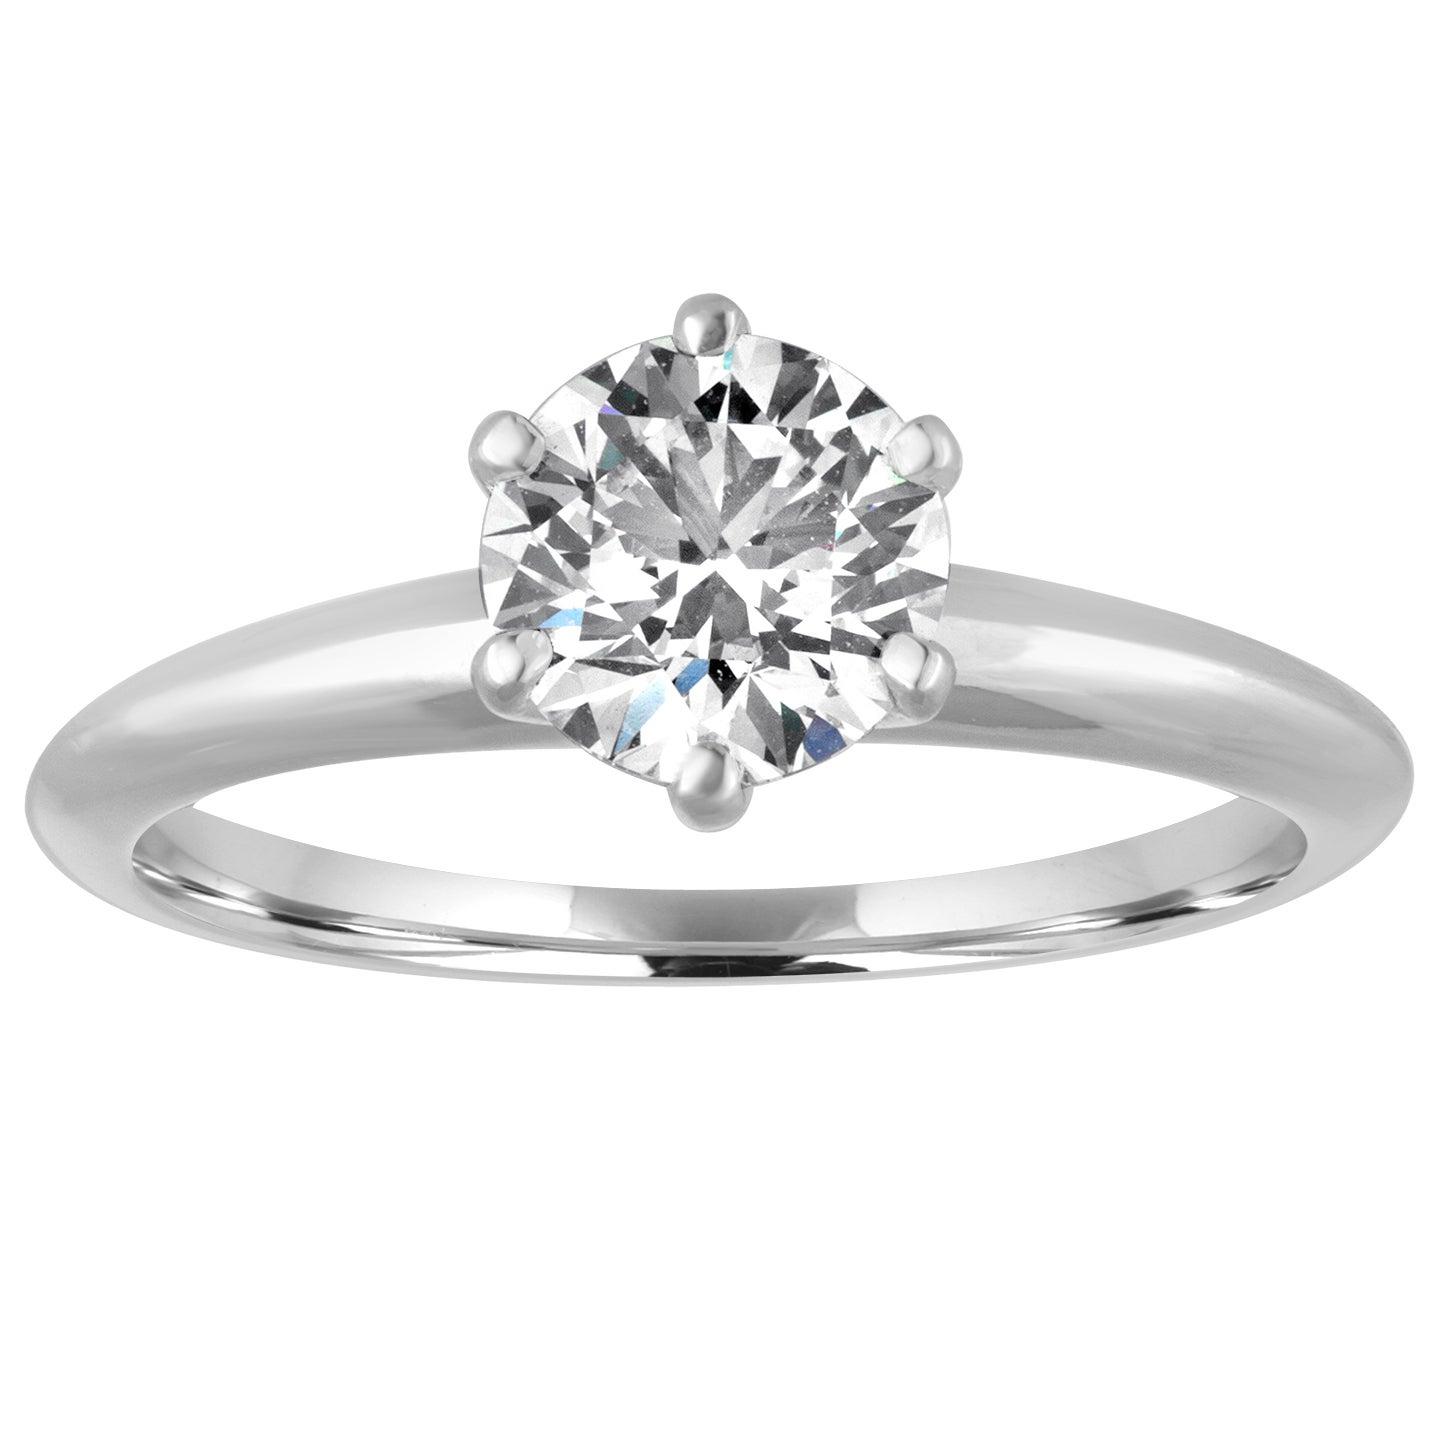 Tiffany & Co. GIA Certified 1.19 Carat F VS1 Diamond Platinum Ring